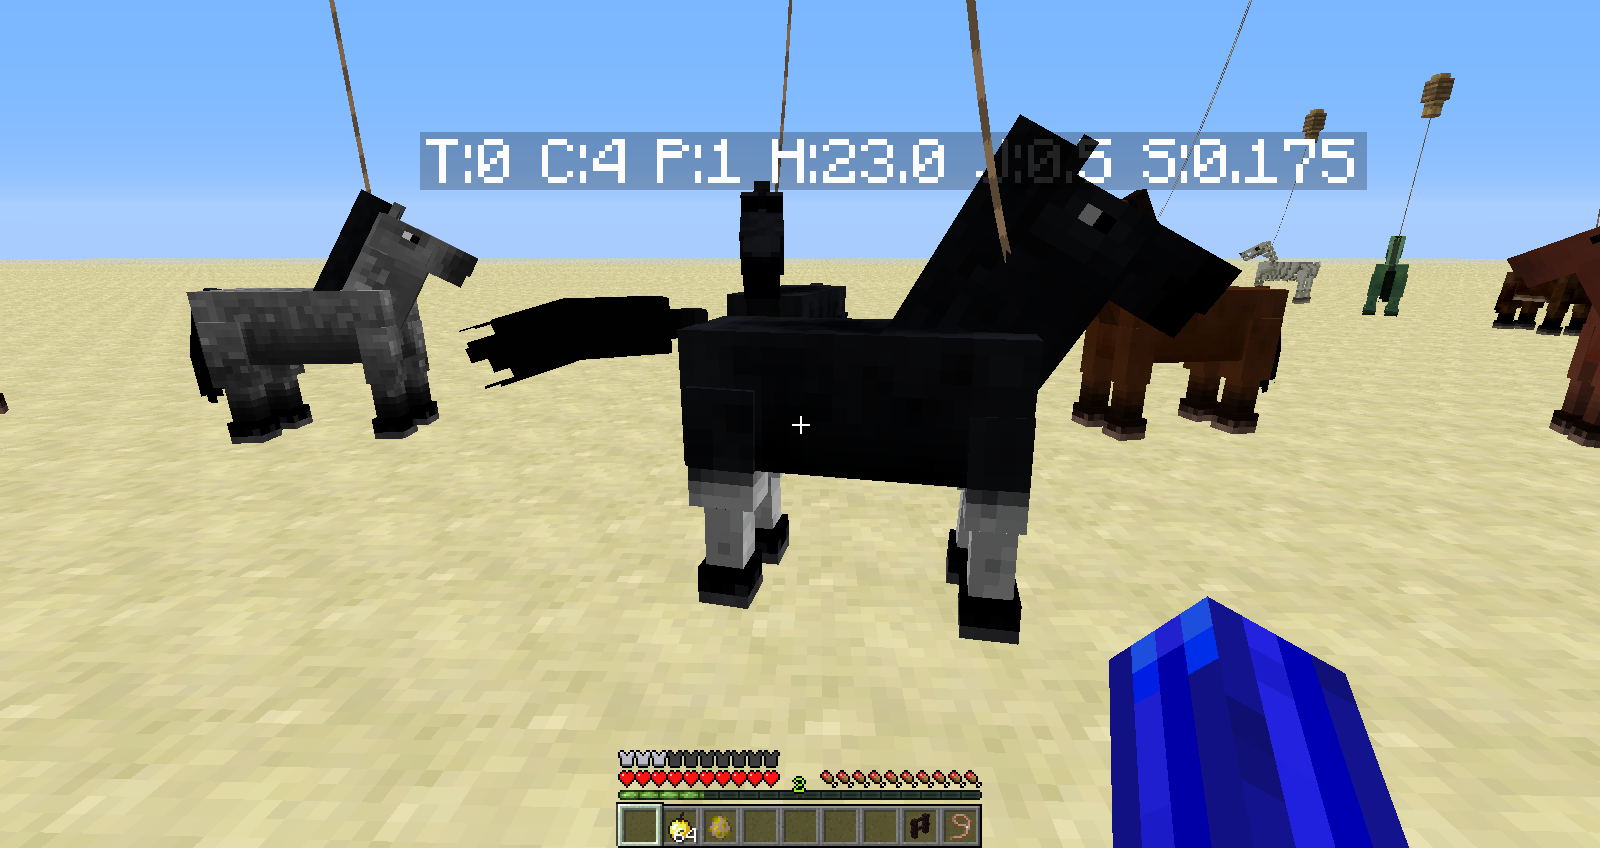 MC-16533] Horse Breeding never exceeds egg/spawn horse